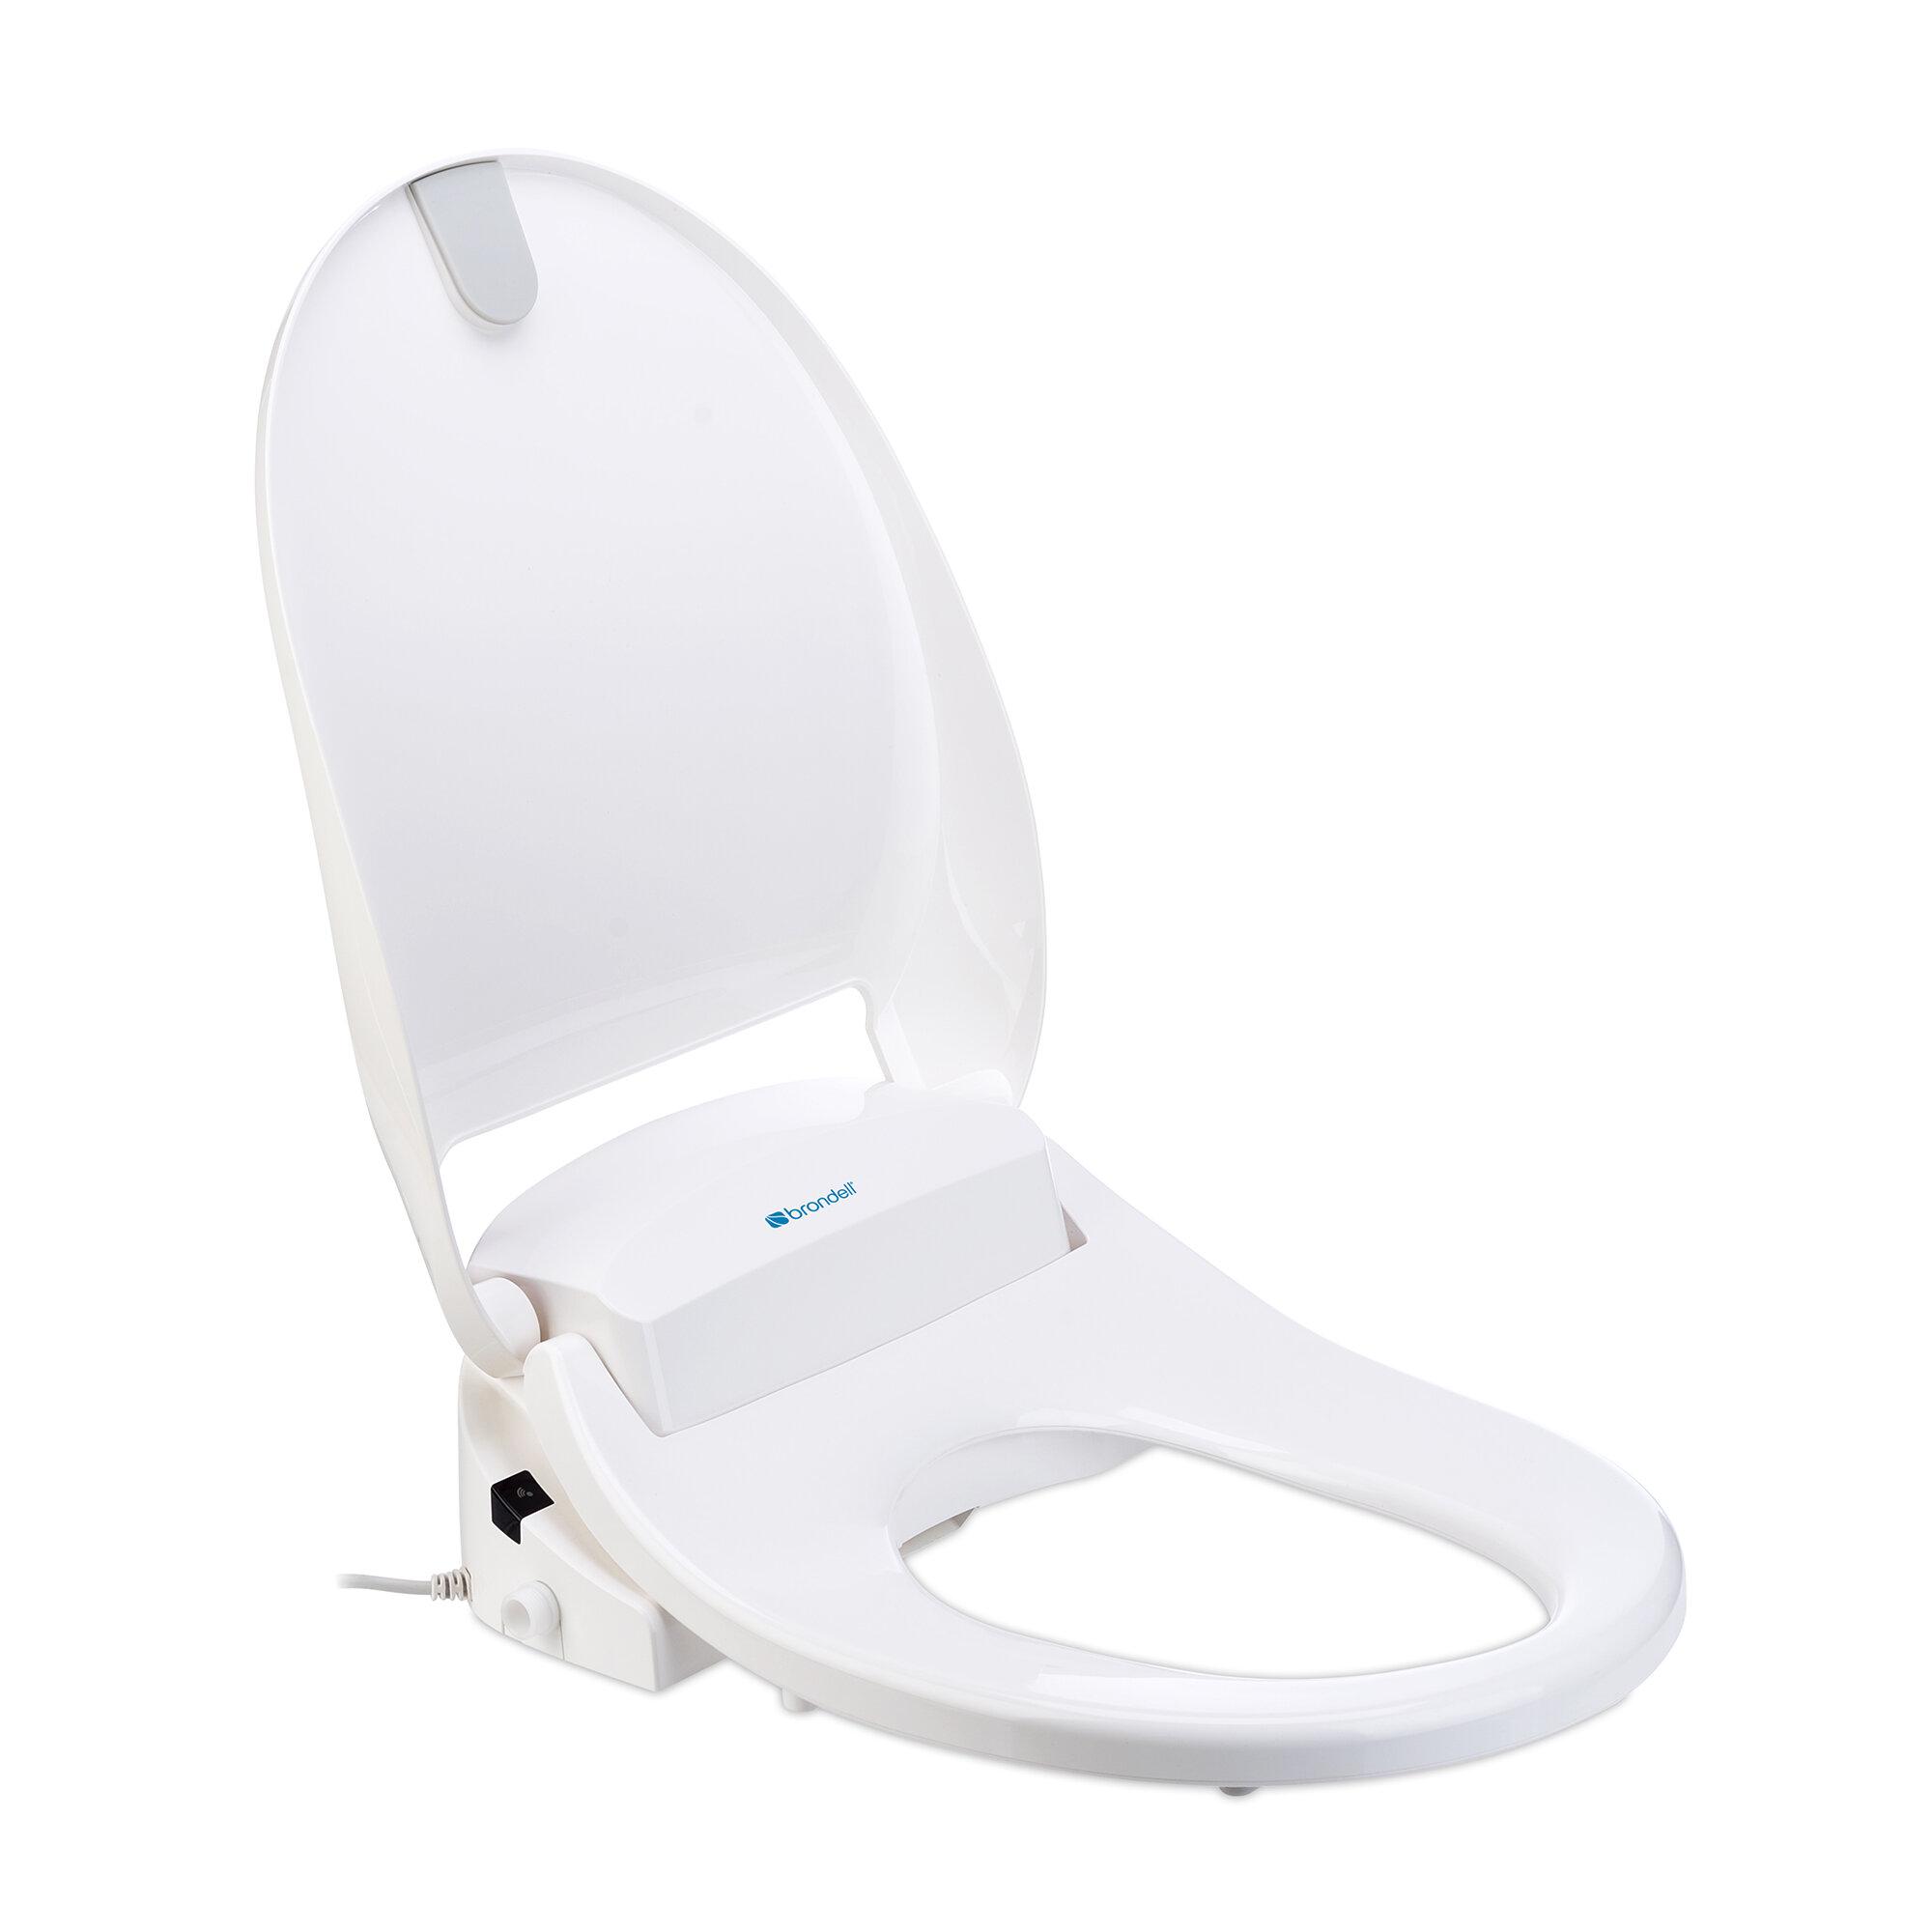 Brondell Swash 300 Elongated Bidet Toilet Seat Bidet Reviews Wayfair